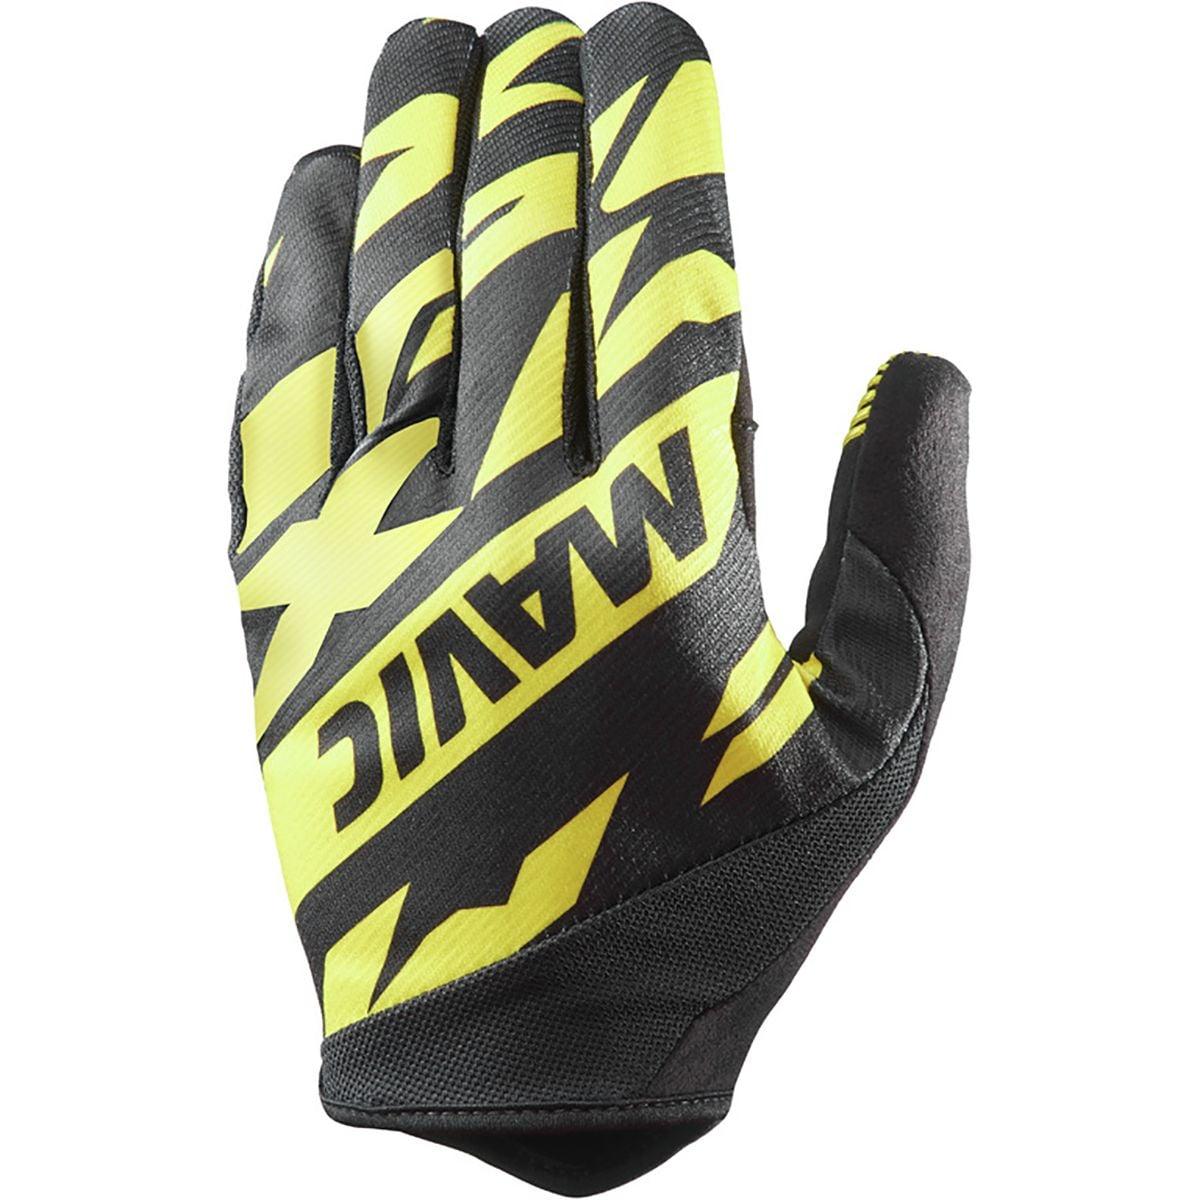 Mavic Deemax Pro Glove - Men's